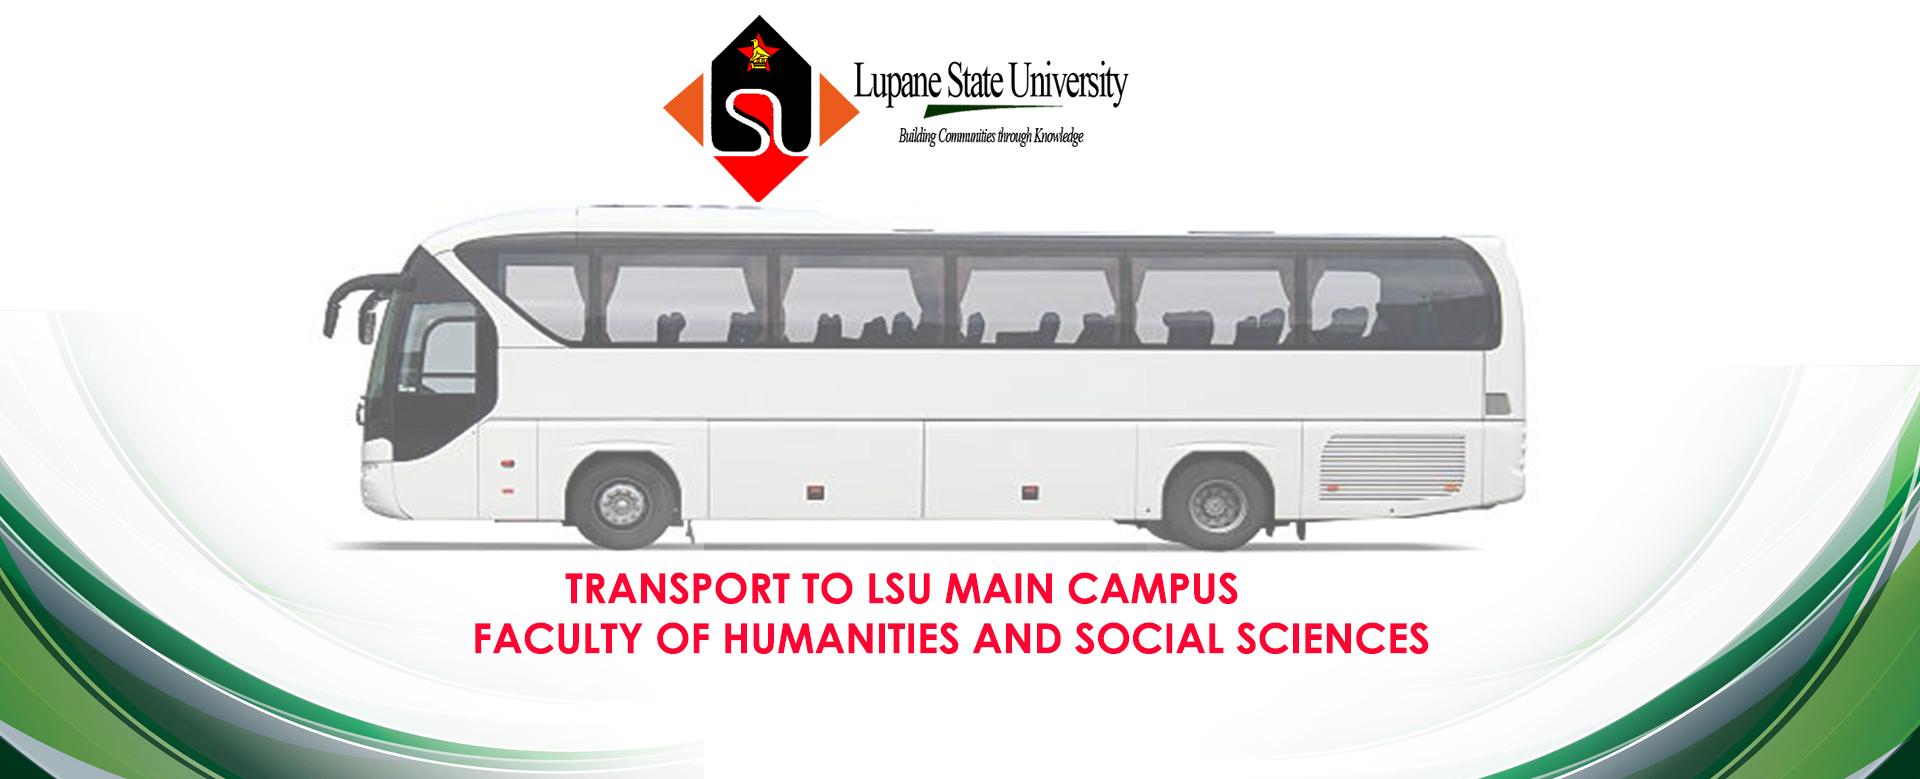 Student Transport to Lupane State University Main Campus